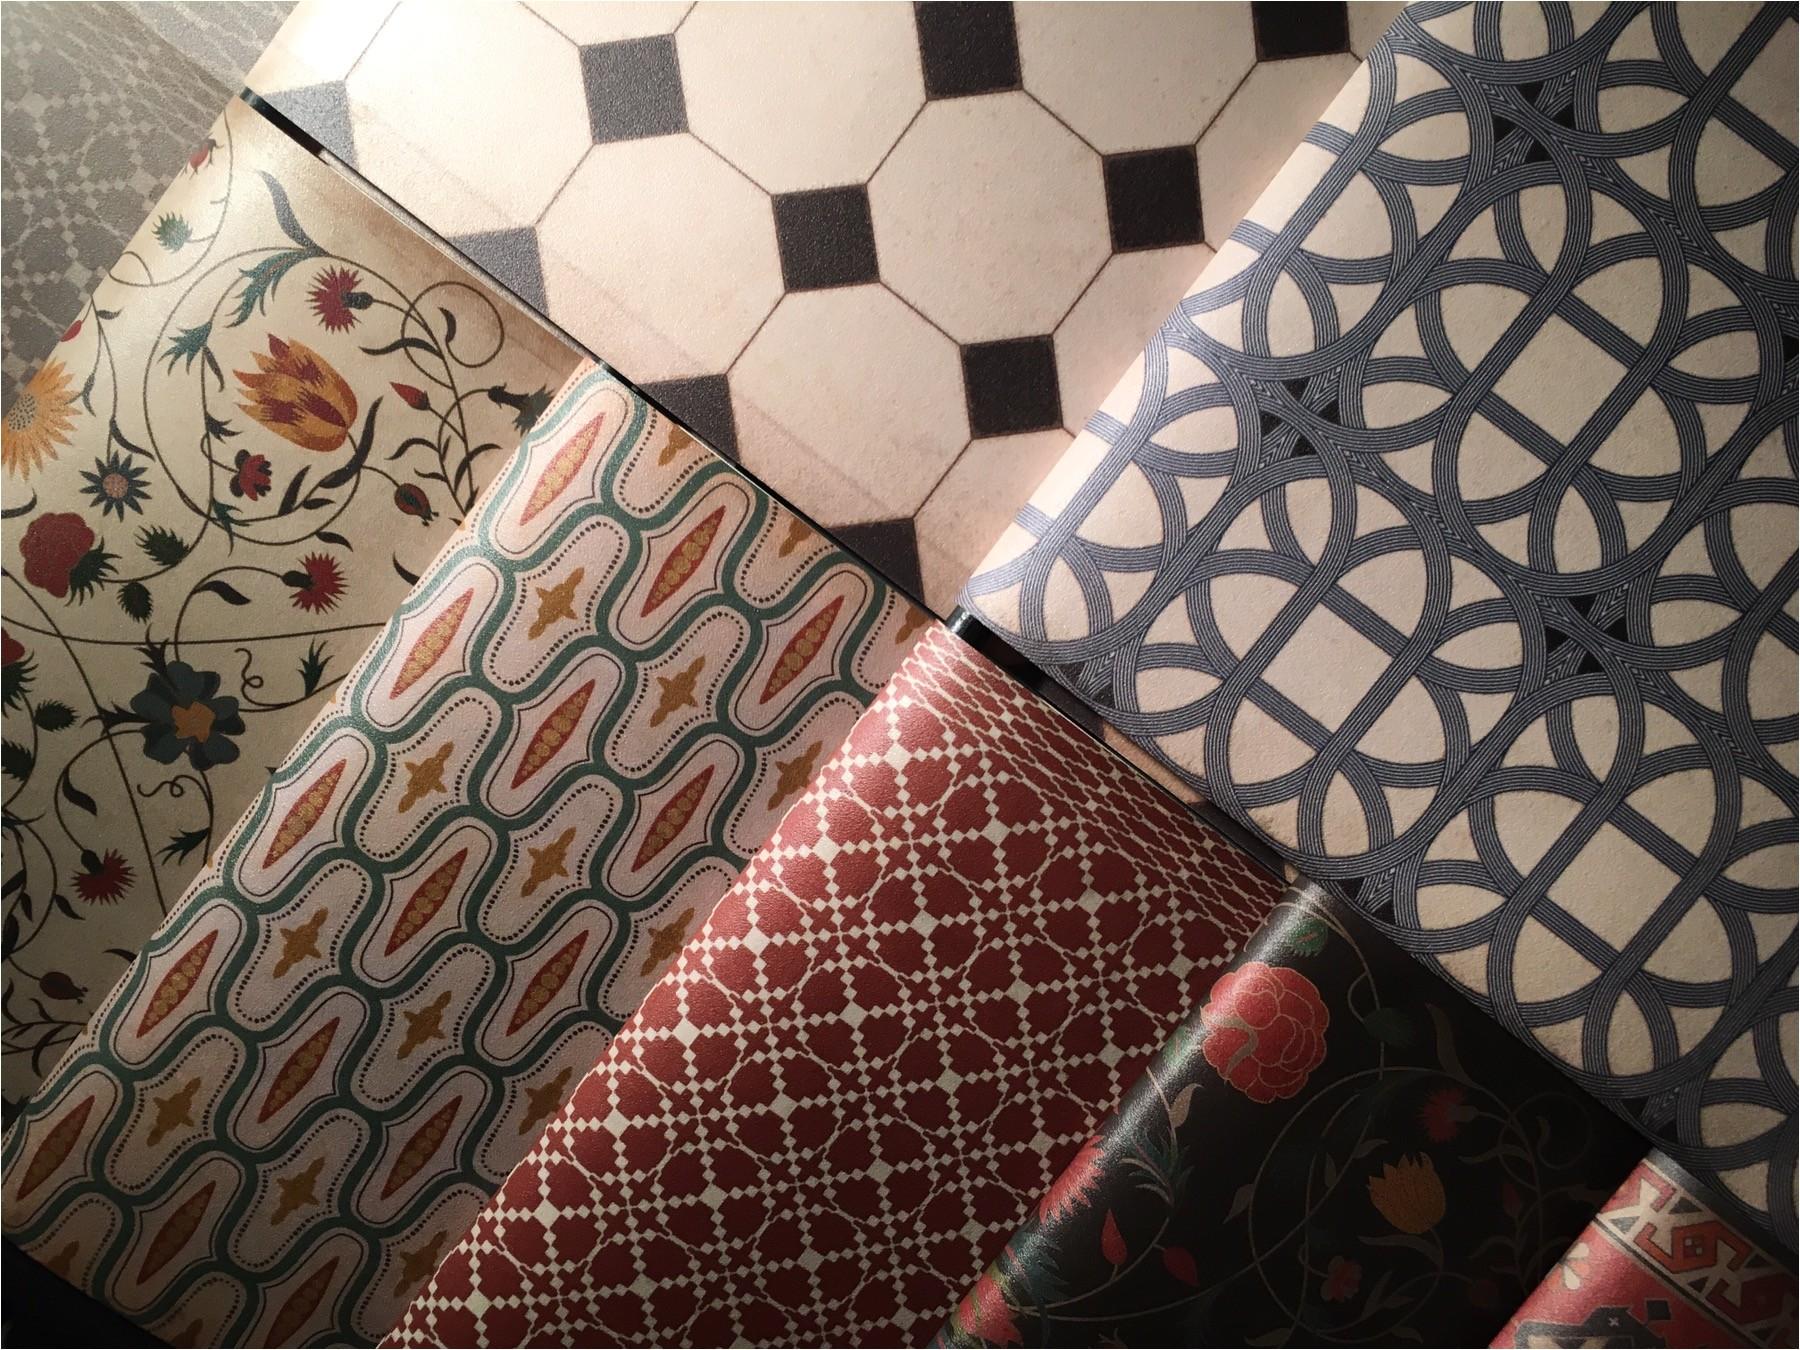 spicher and co inovative vintage vinyl floorcloths at americasmart